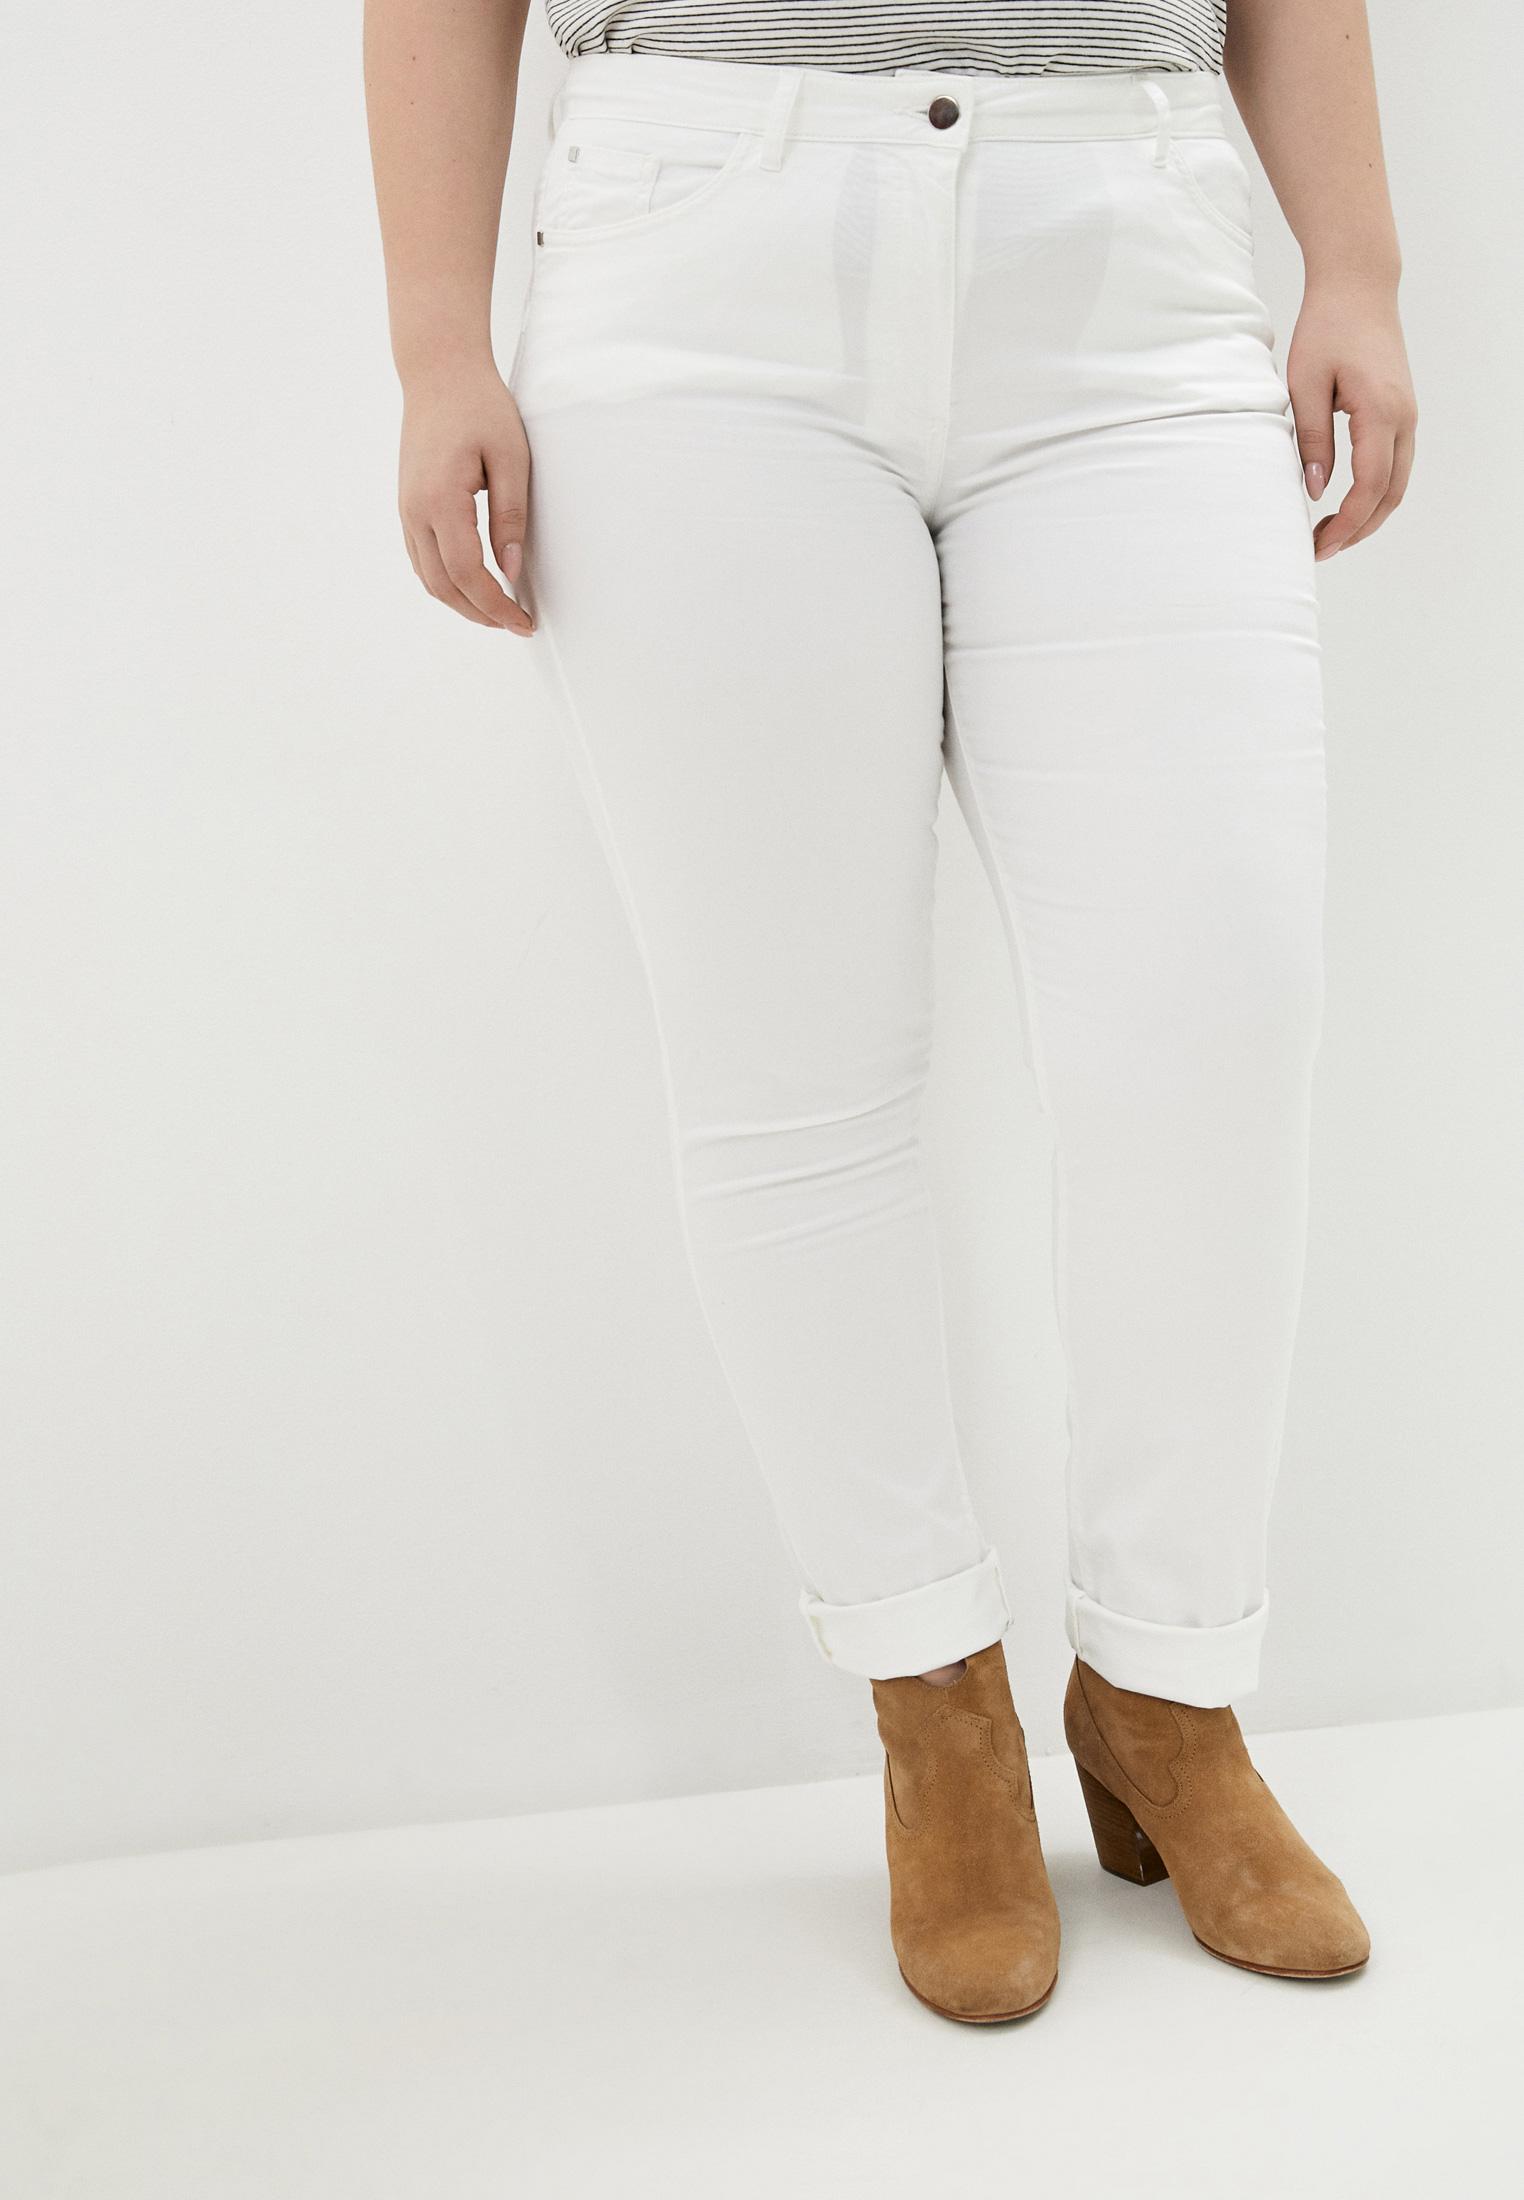 Зауженные джинсы Persona by Marina Rinaldi 1132050